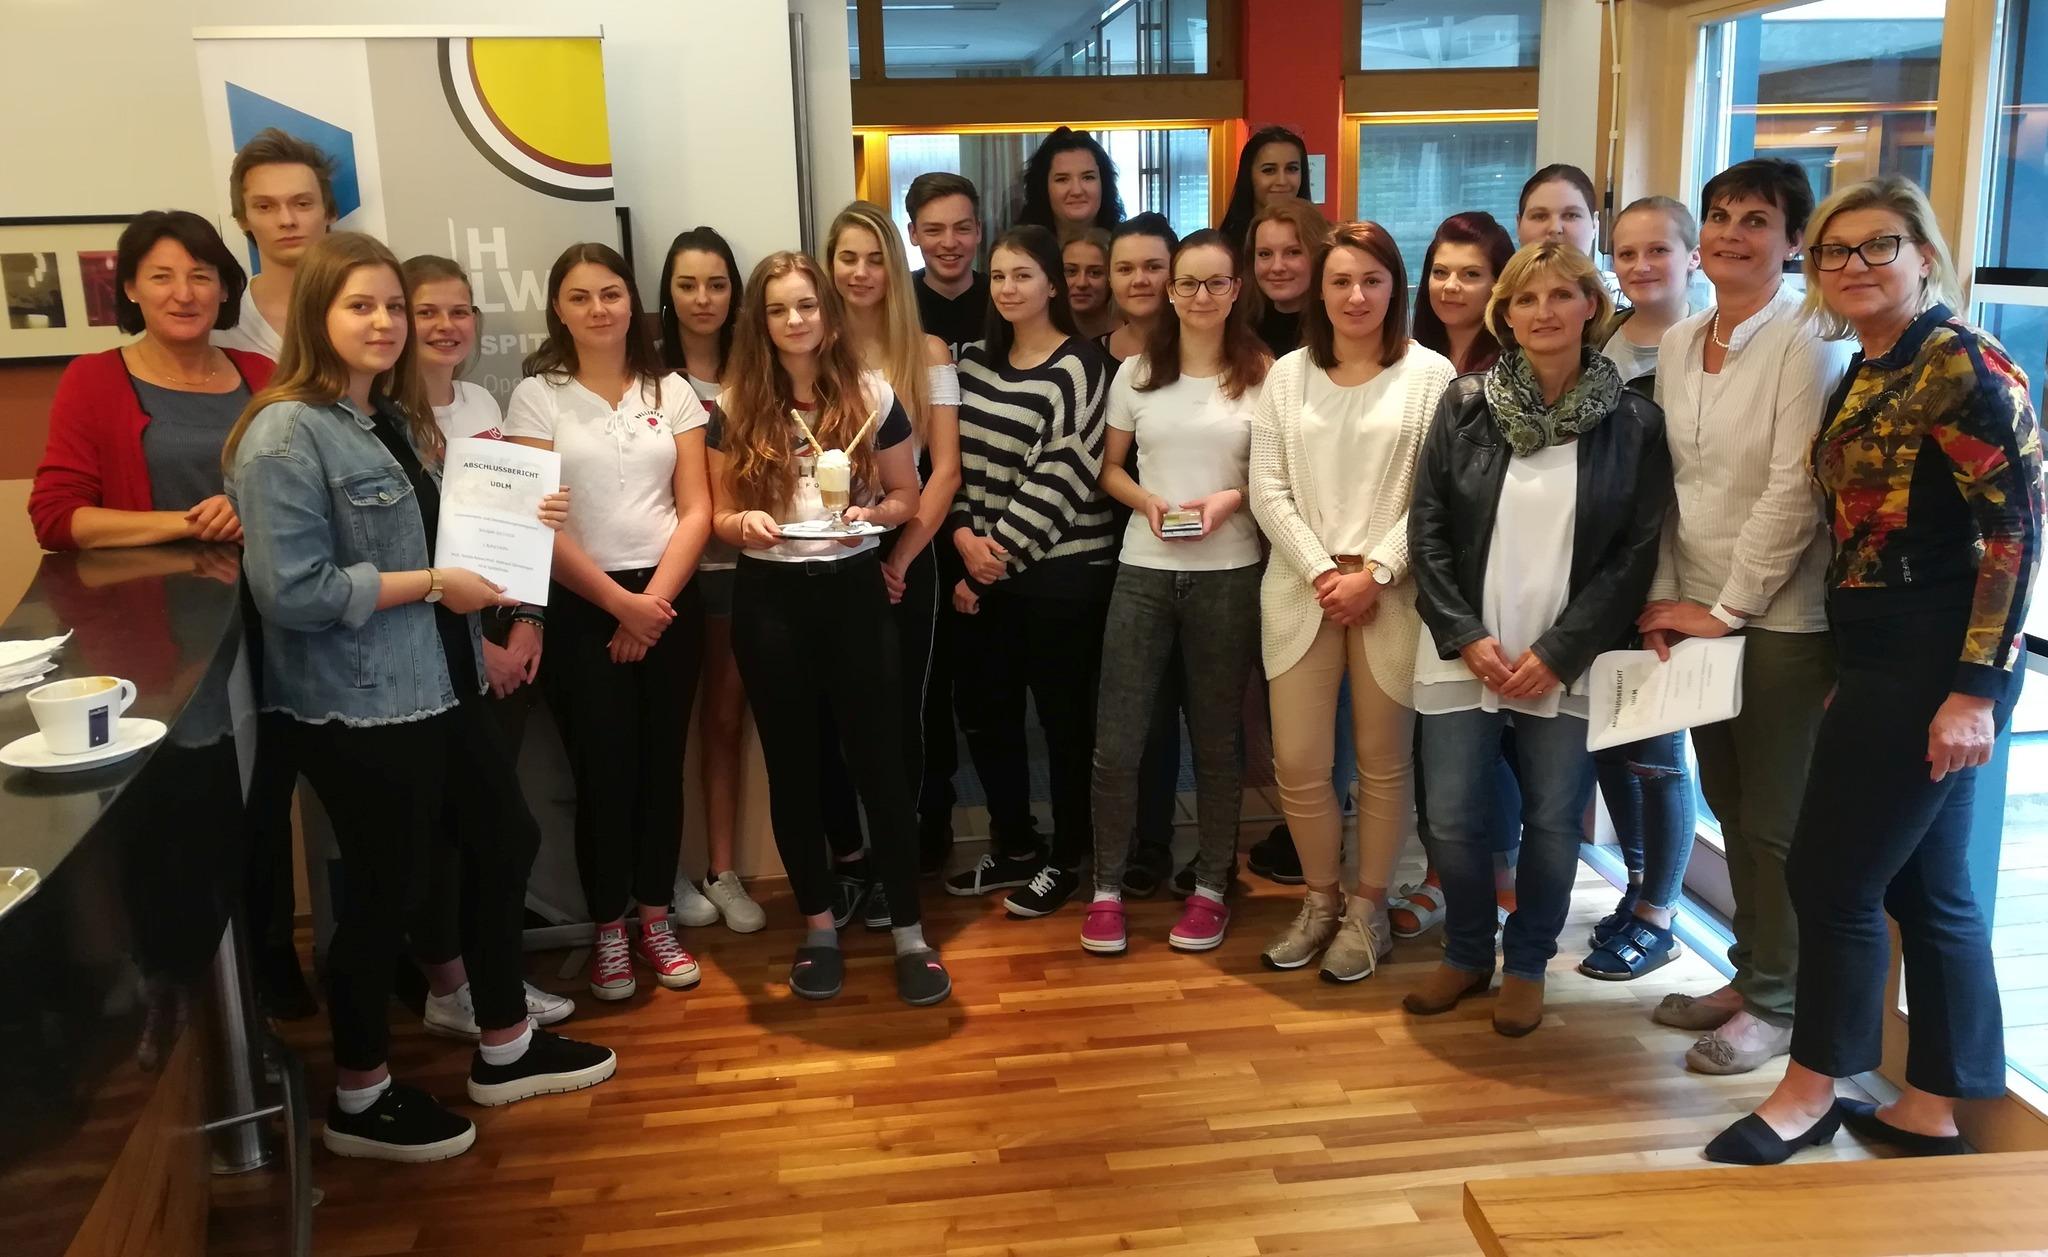 Bekanntschaften in Millstatt - Partnersuche & Kontakte